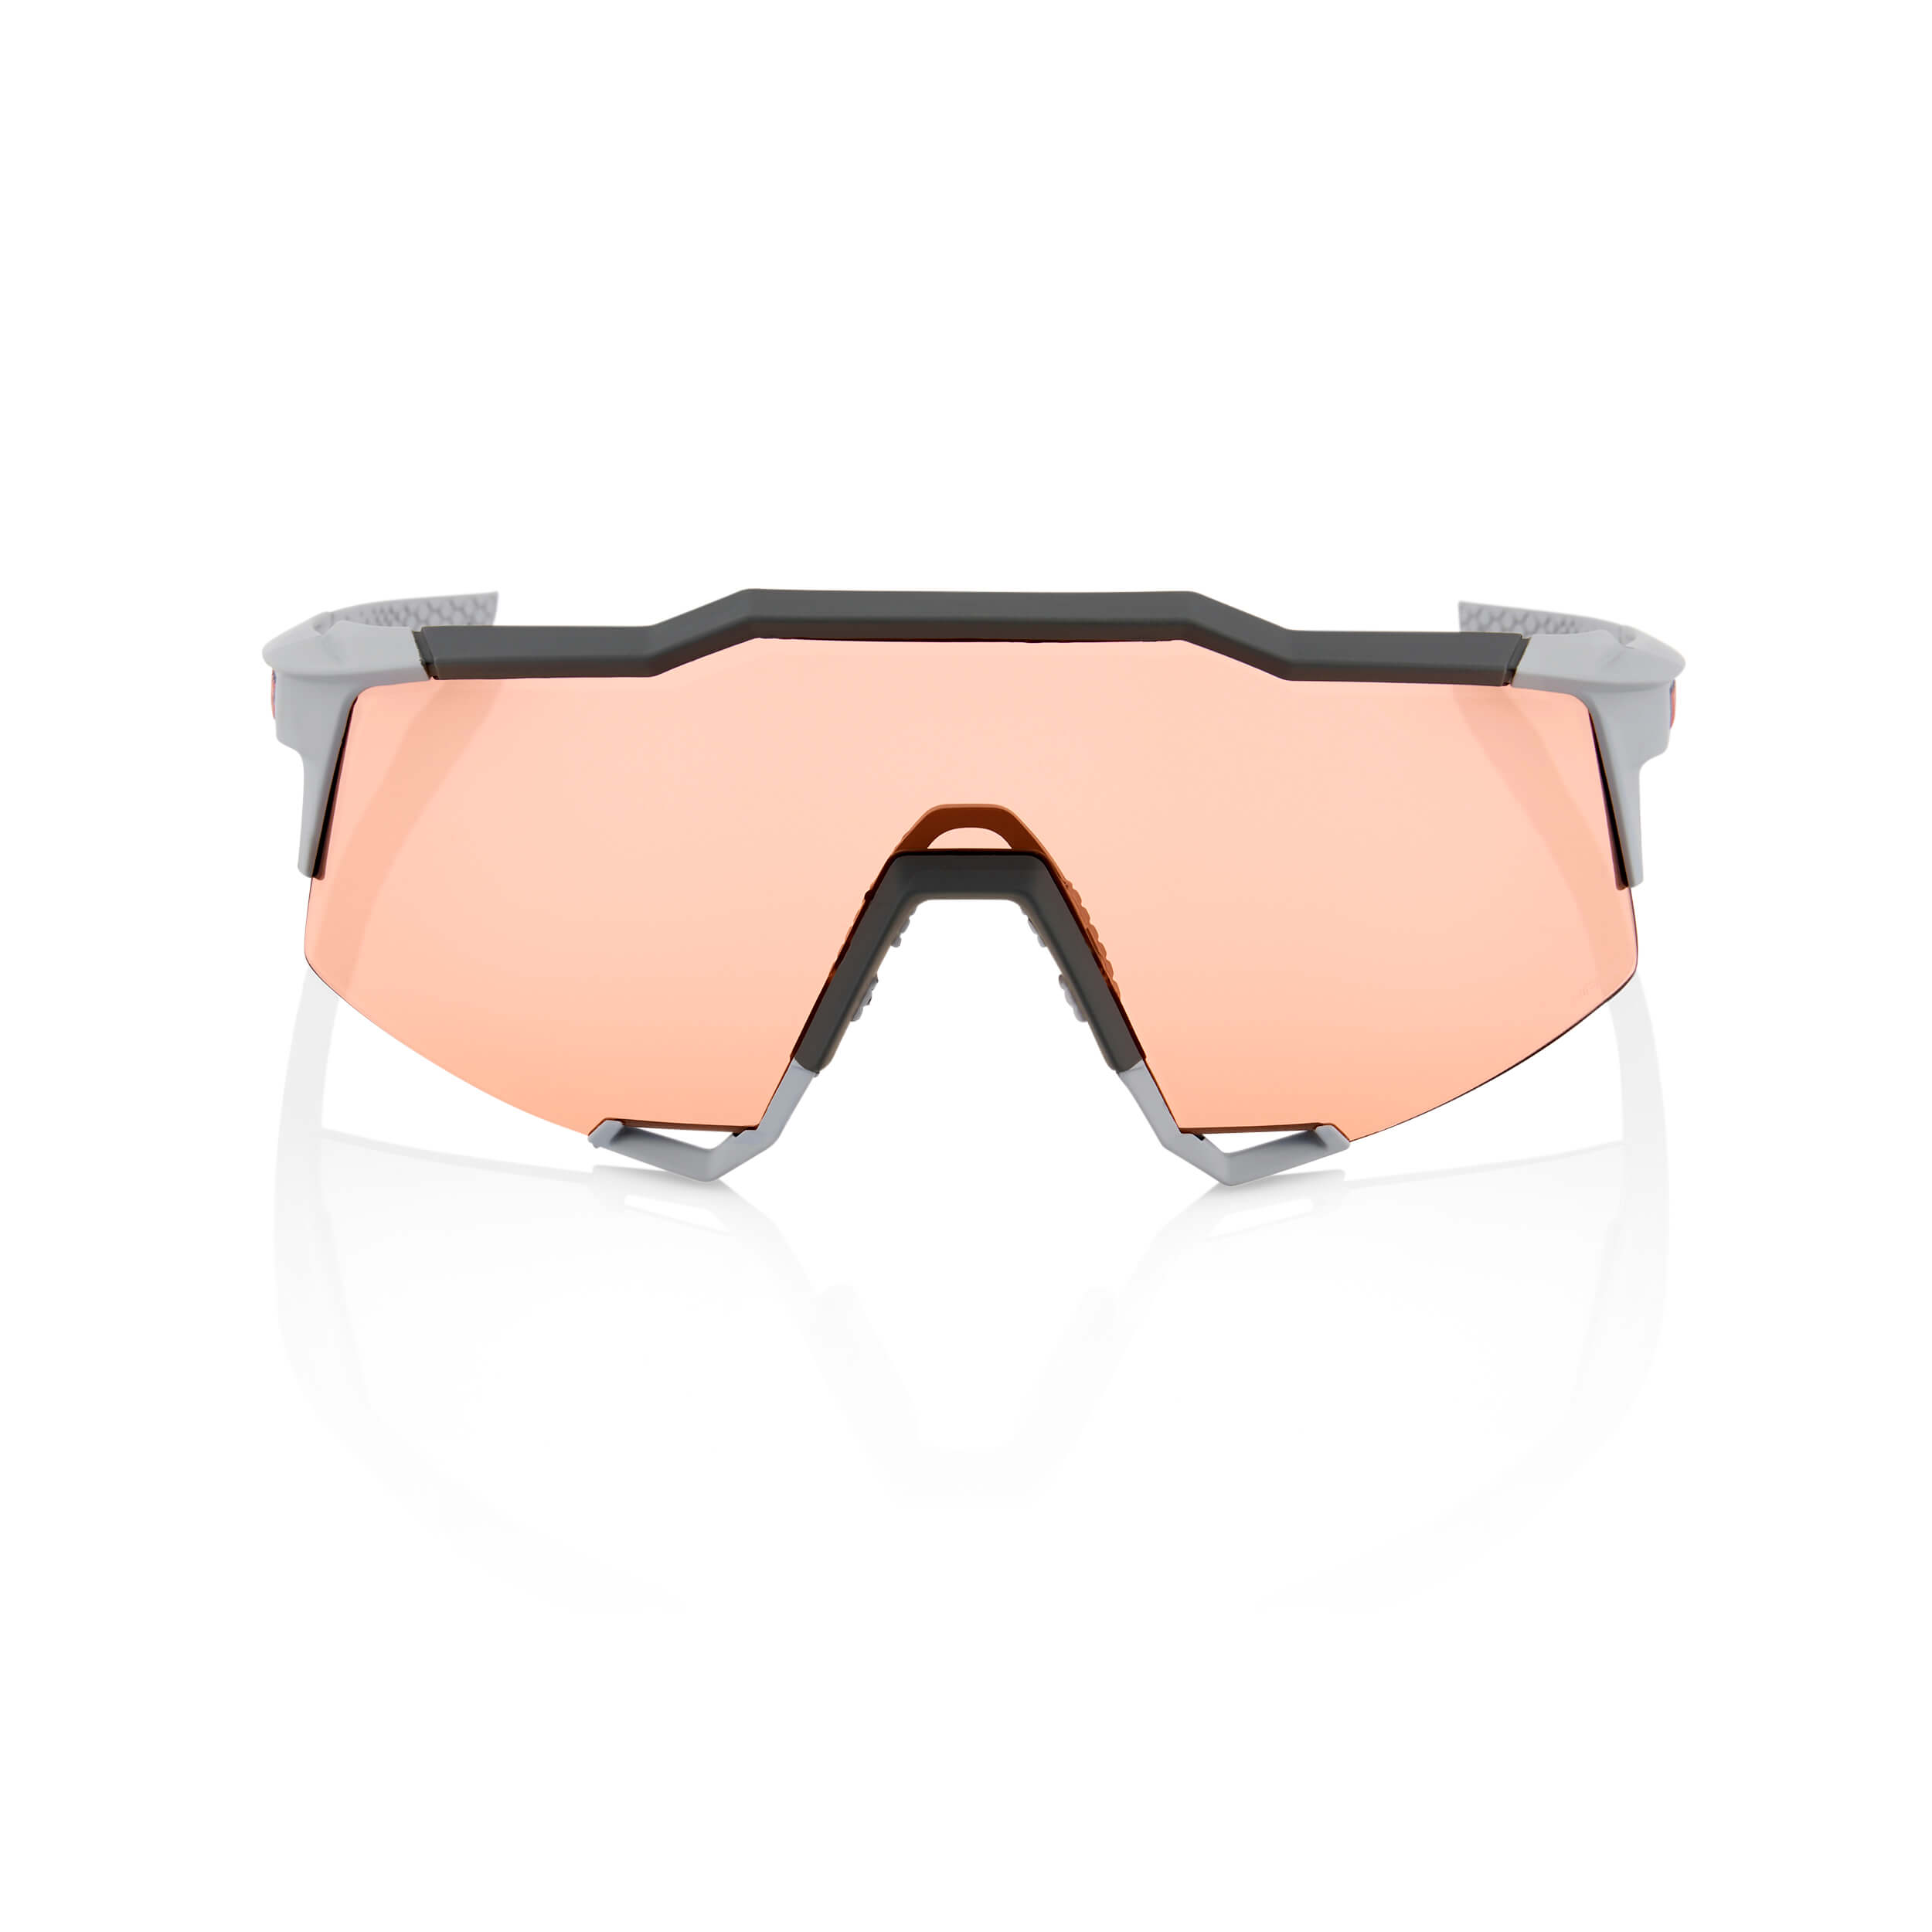 SPEEDCRAFT – Soft Tact Stone Grey – HiPER Coral Lens